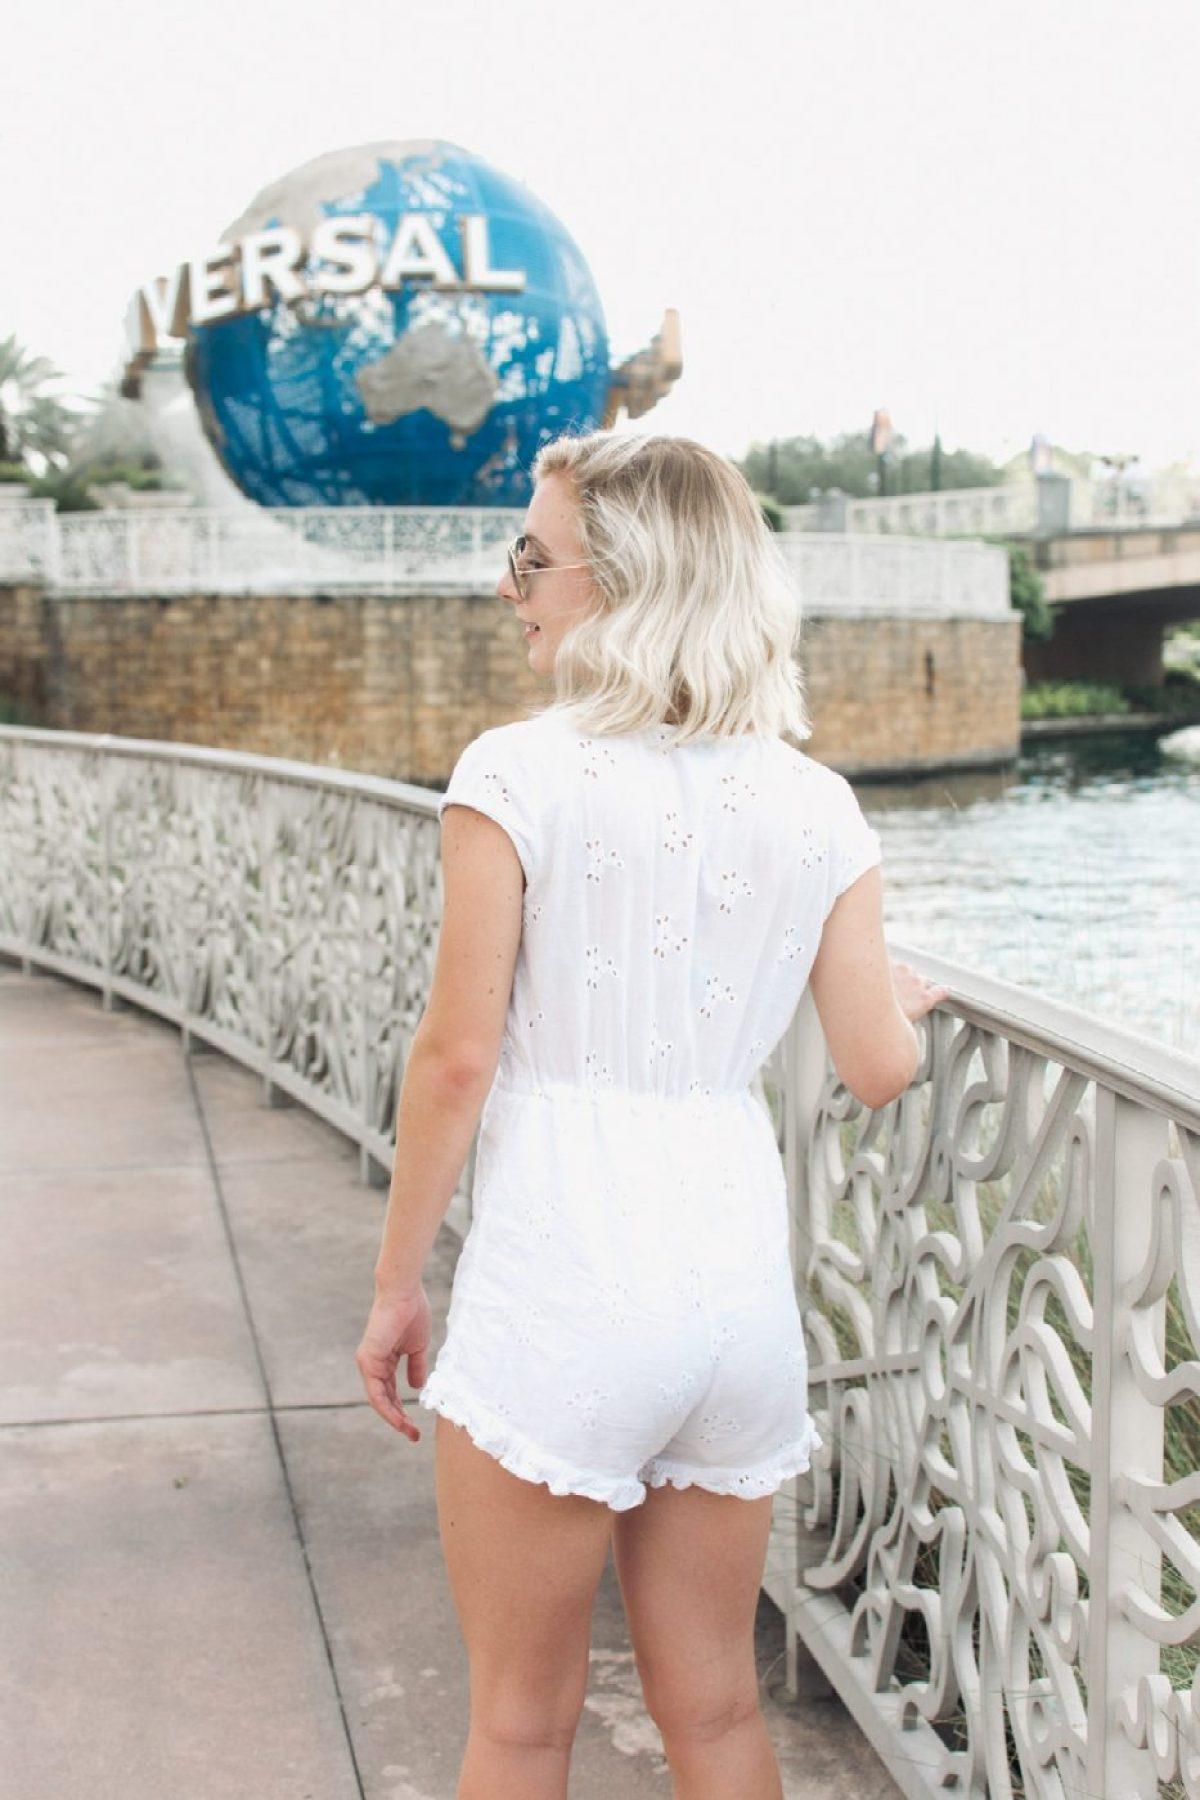 Jenny Bess in front of Universal Studios globe